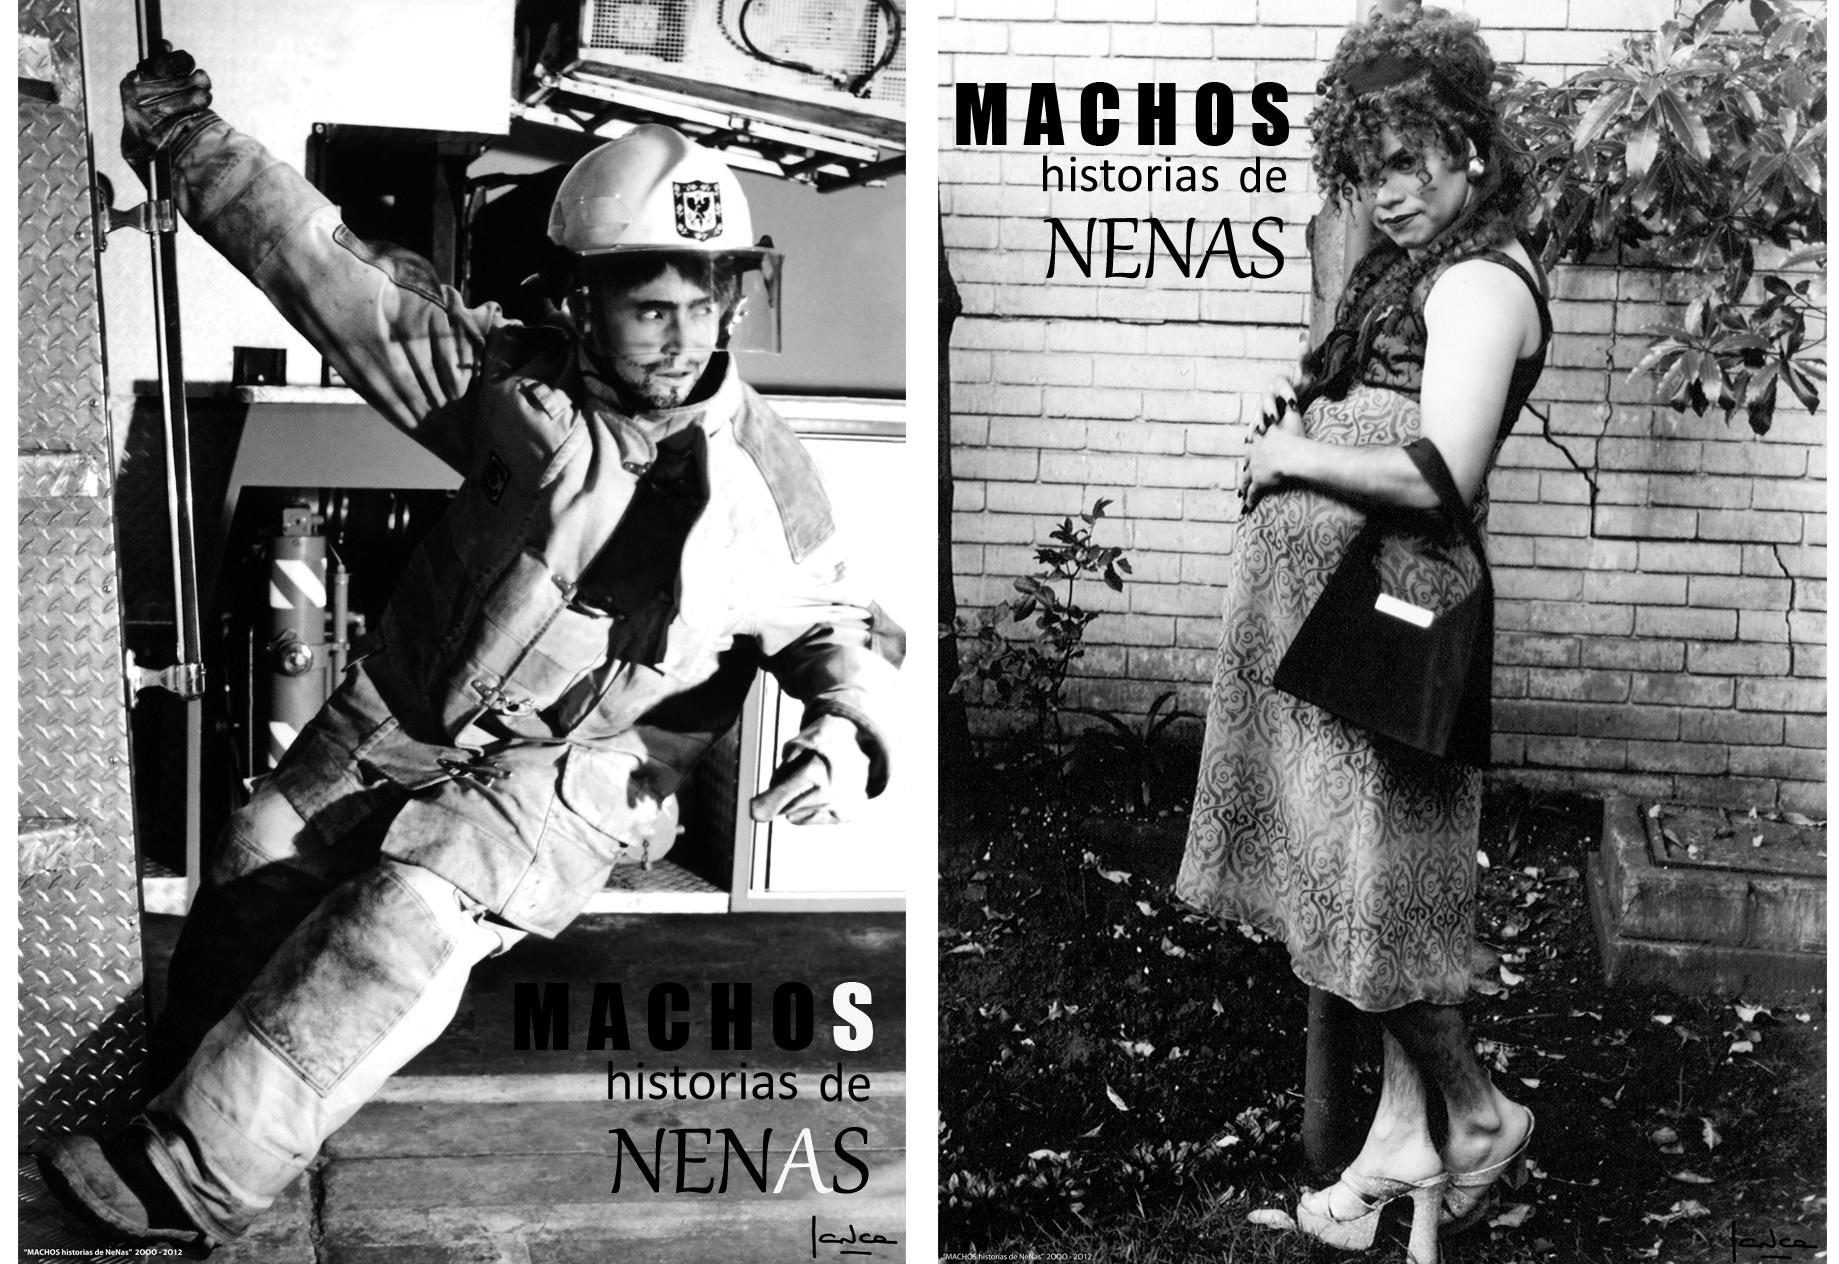 MACHOS, historias de NeNas